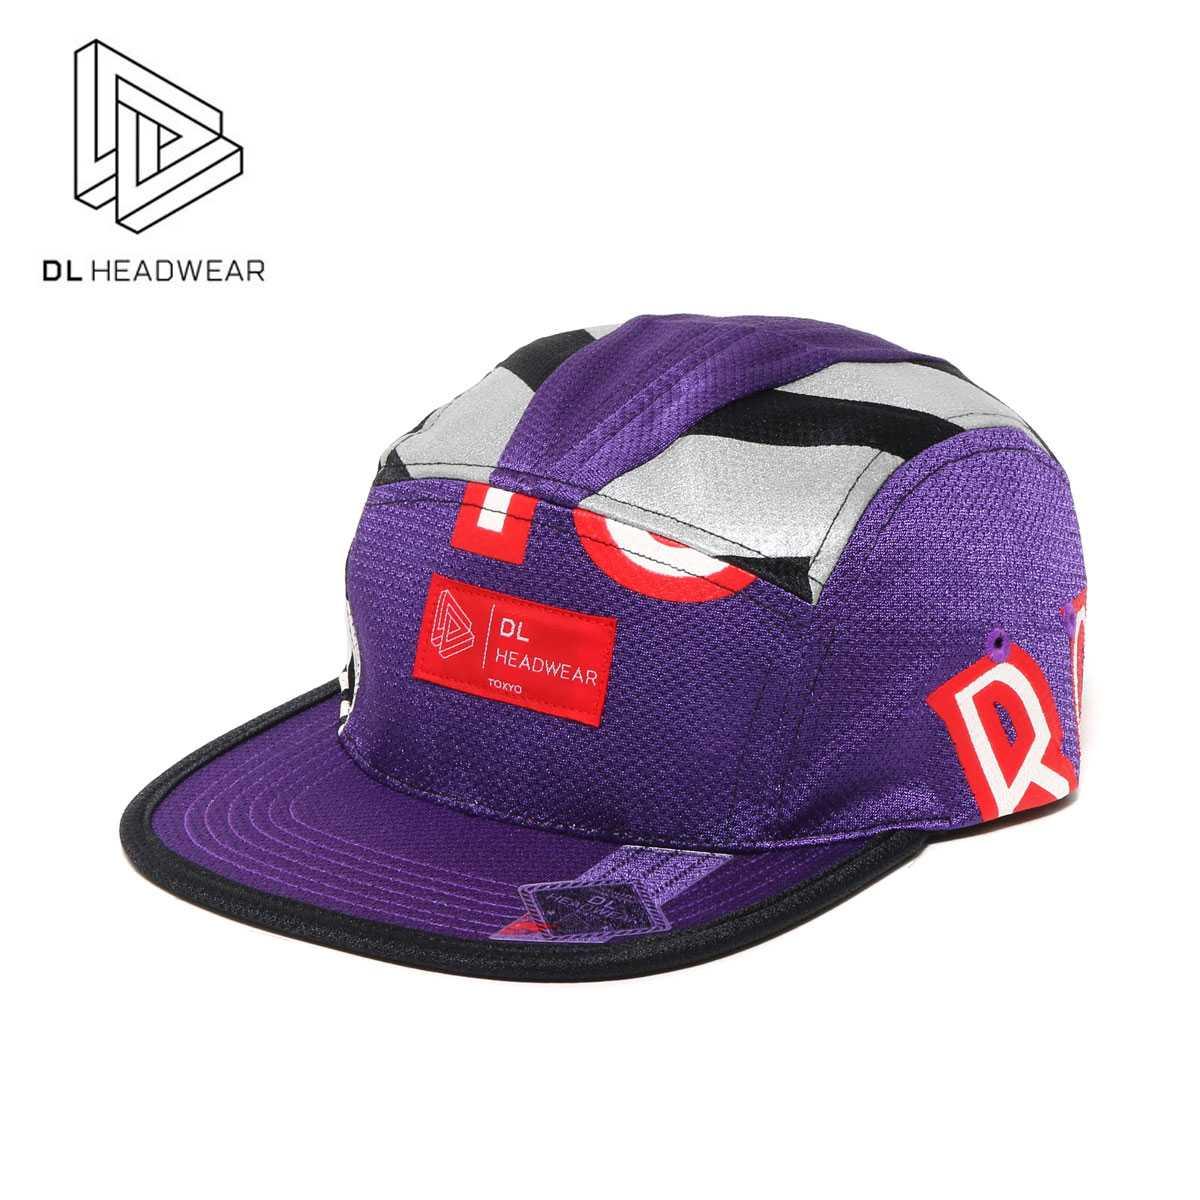 DL Headwear Alpha 5Panel Camp Cap Made by vintage NBA Jersey(Vince Carter / Toronto Raptors)(ディーエル ヘッドウェア アルファ ファイブパネルキャンプキャップ / ヴィンス・カーター)【Kinetics】【NBA】【バスケットボール】【帽子】【17SS-I】